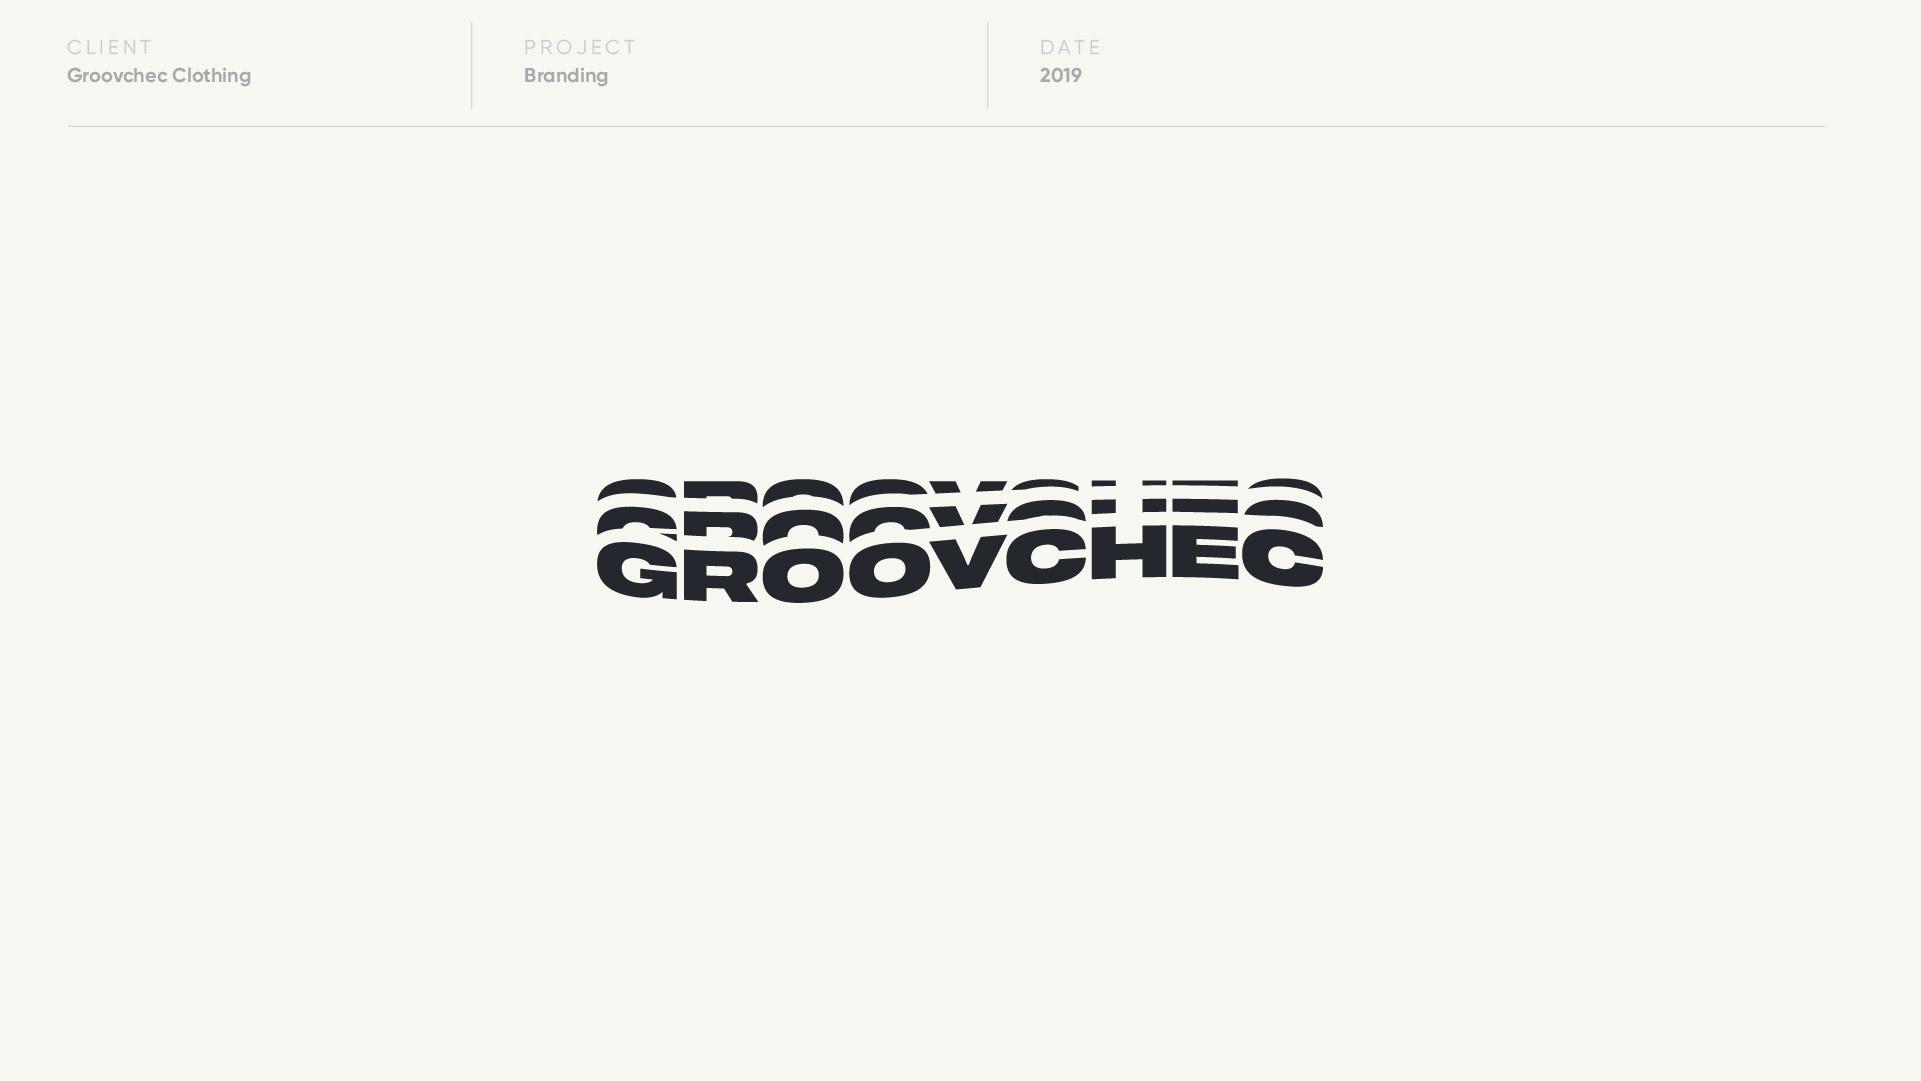 groovchec logo design by anthony mika